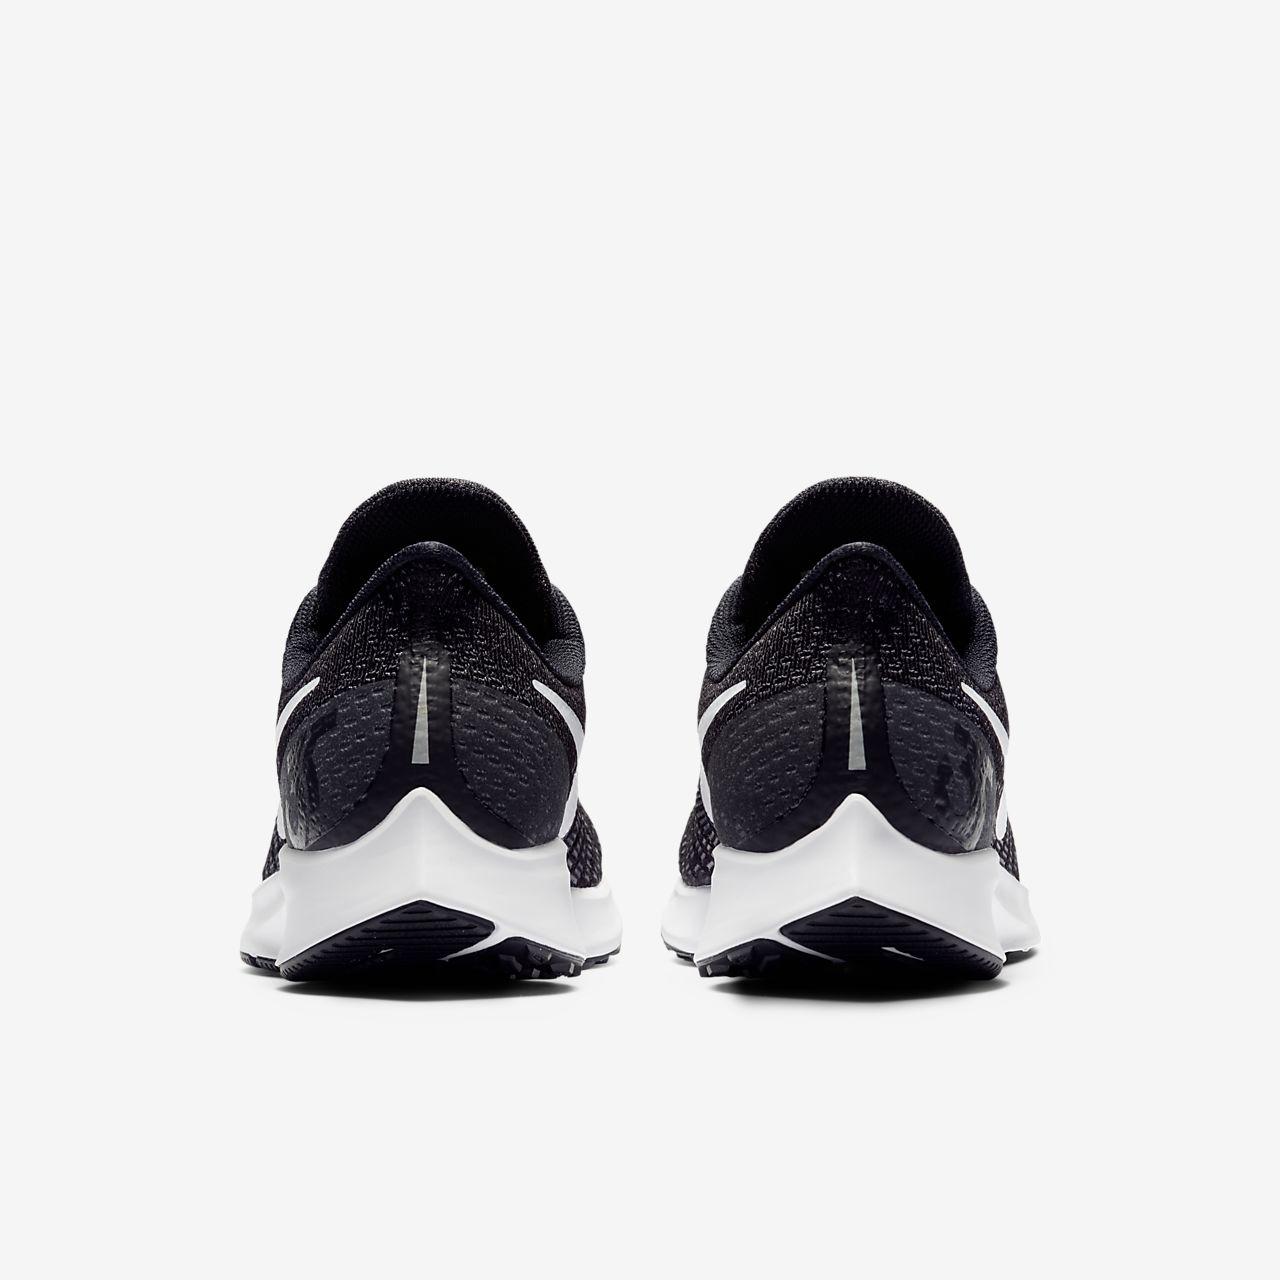 aa92c45f125 Nike Air Zoom Pegasus 35 Women s Running Shoe (Wide). Nike.com AE